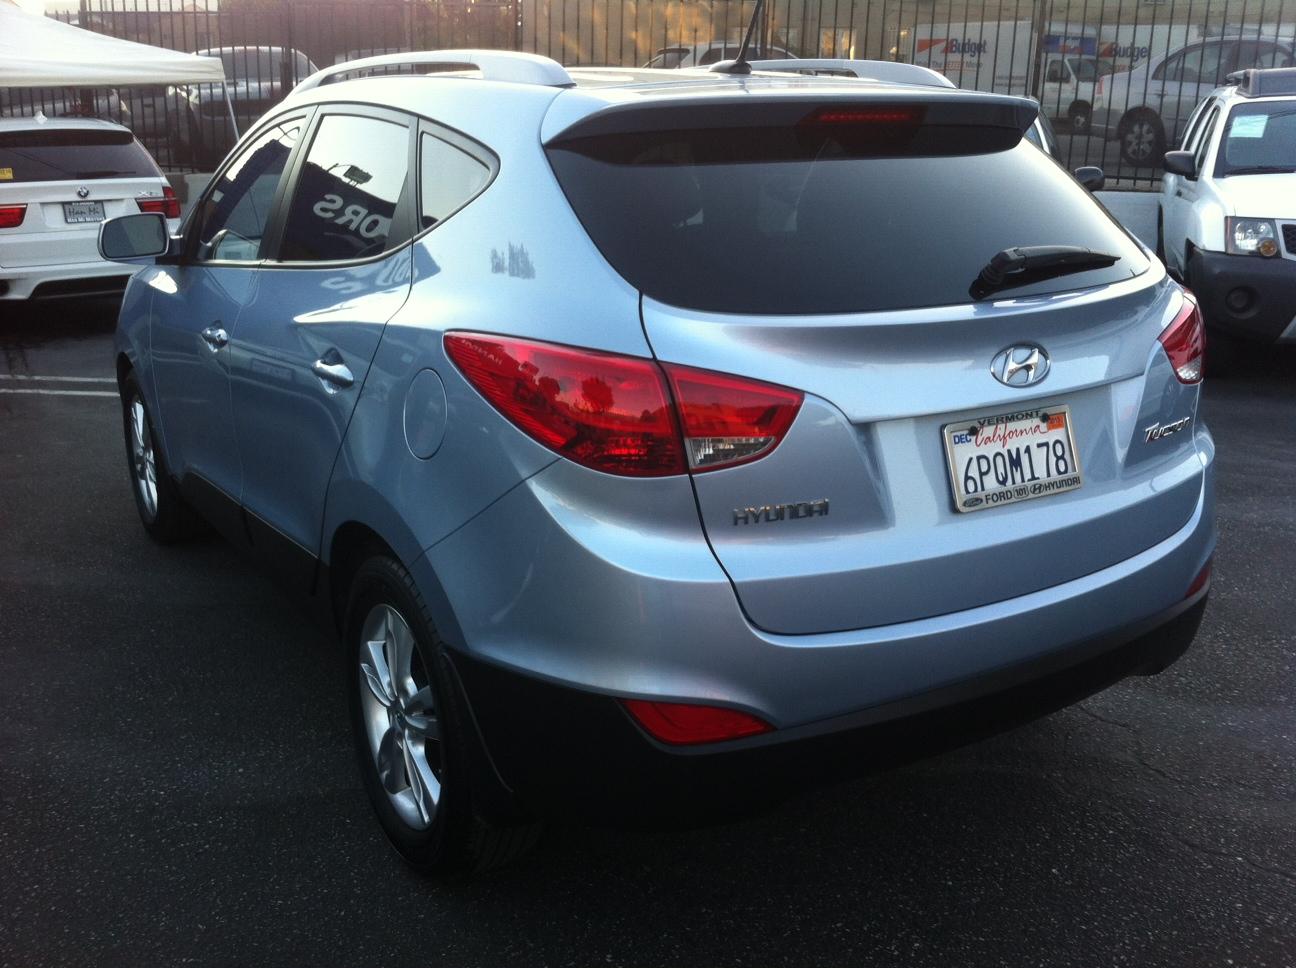 2015 Hyundai Sonata Hybrid >> 2011 Hyundai Tucson - Pictures - CarGurus